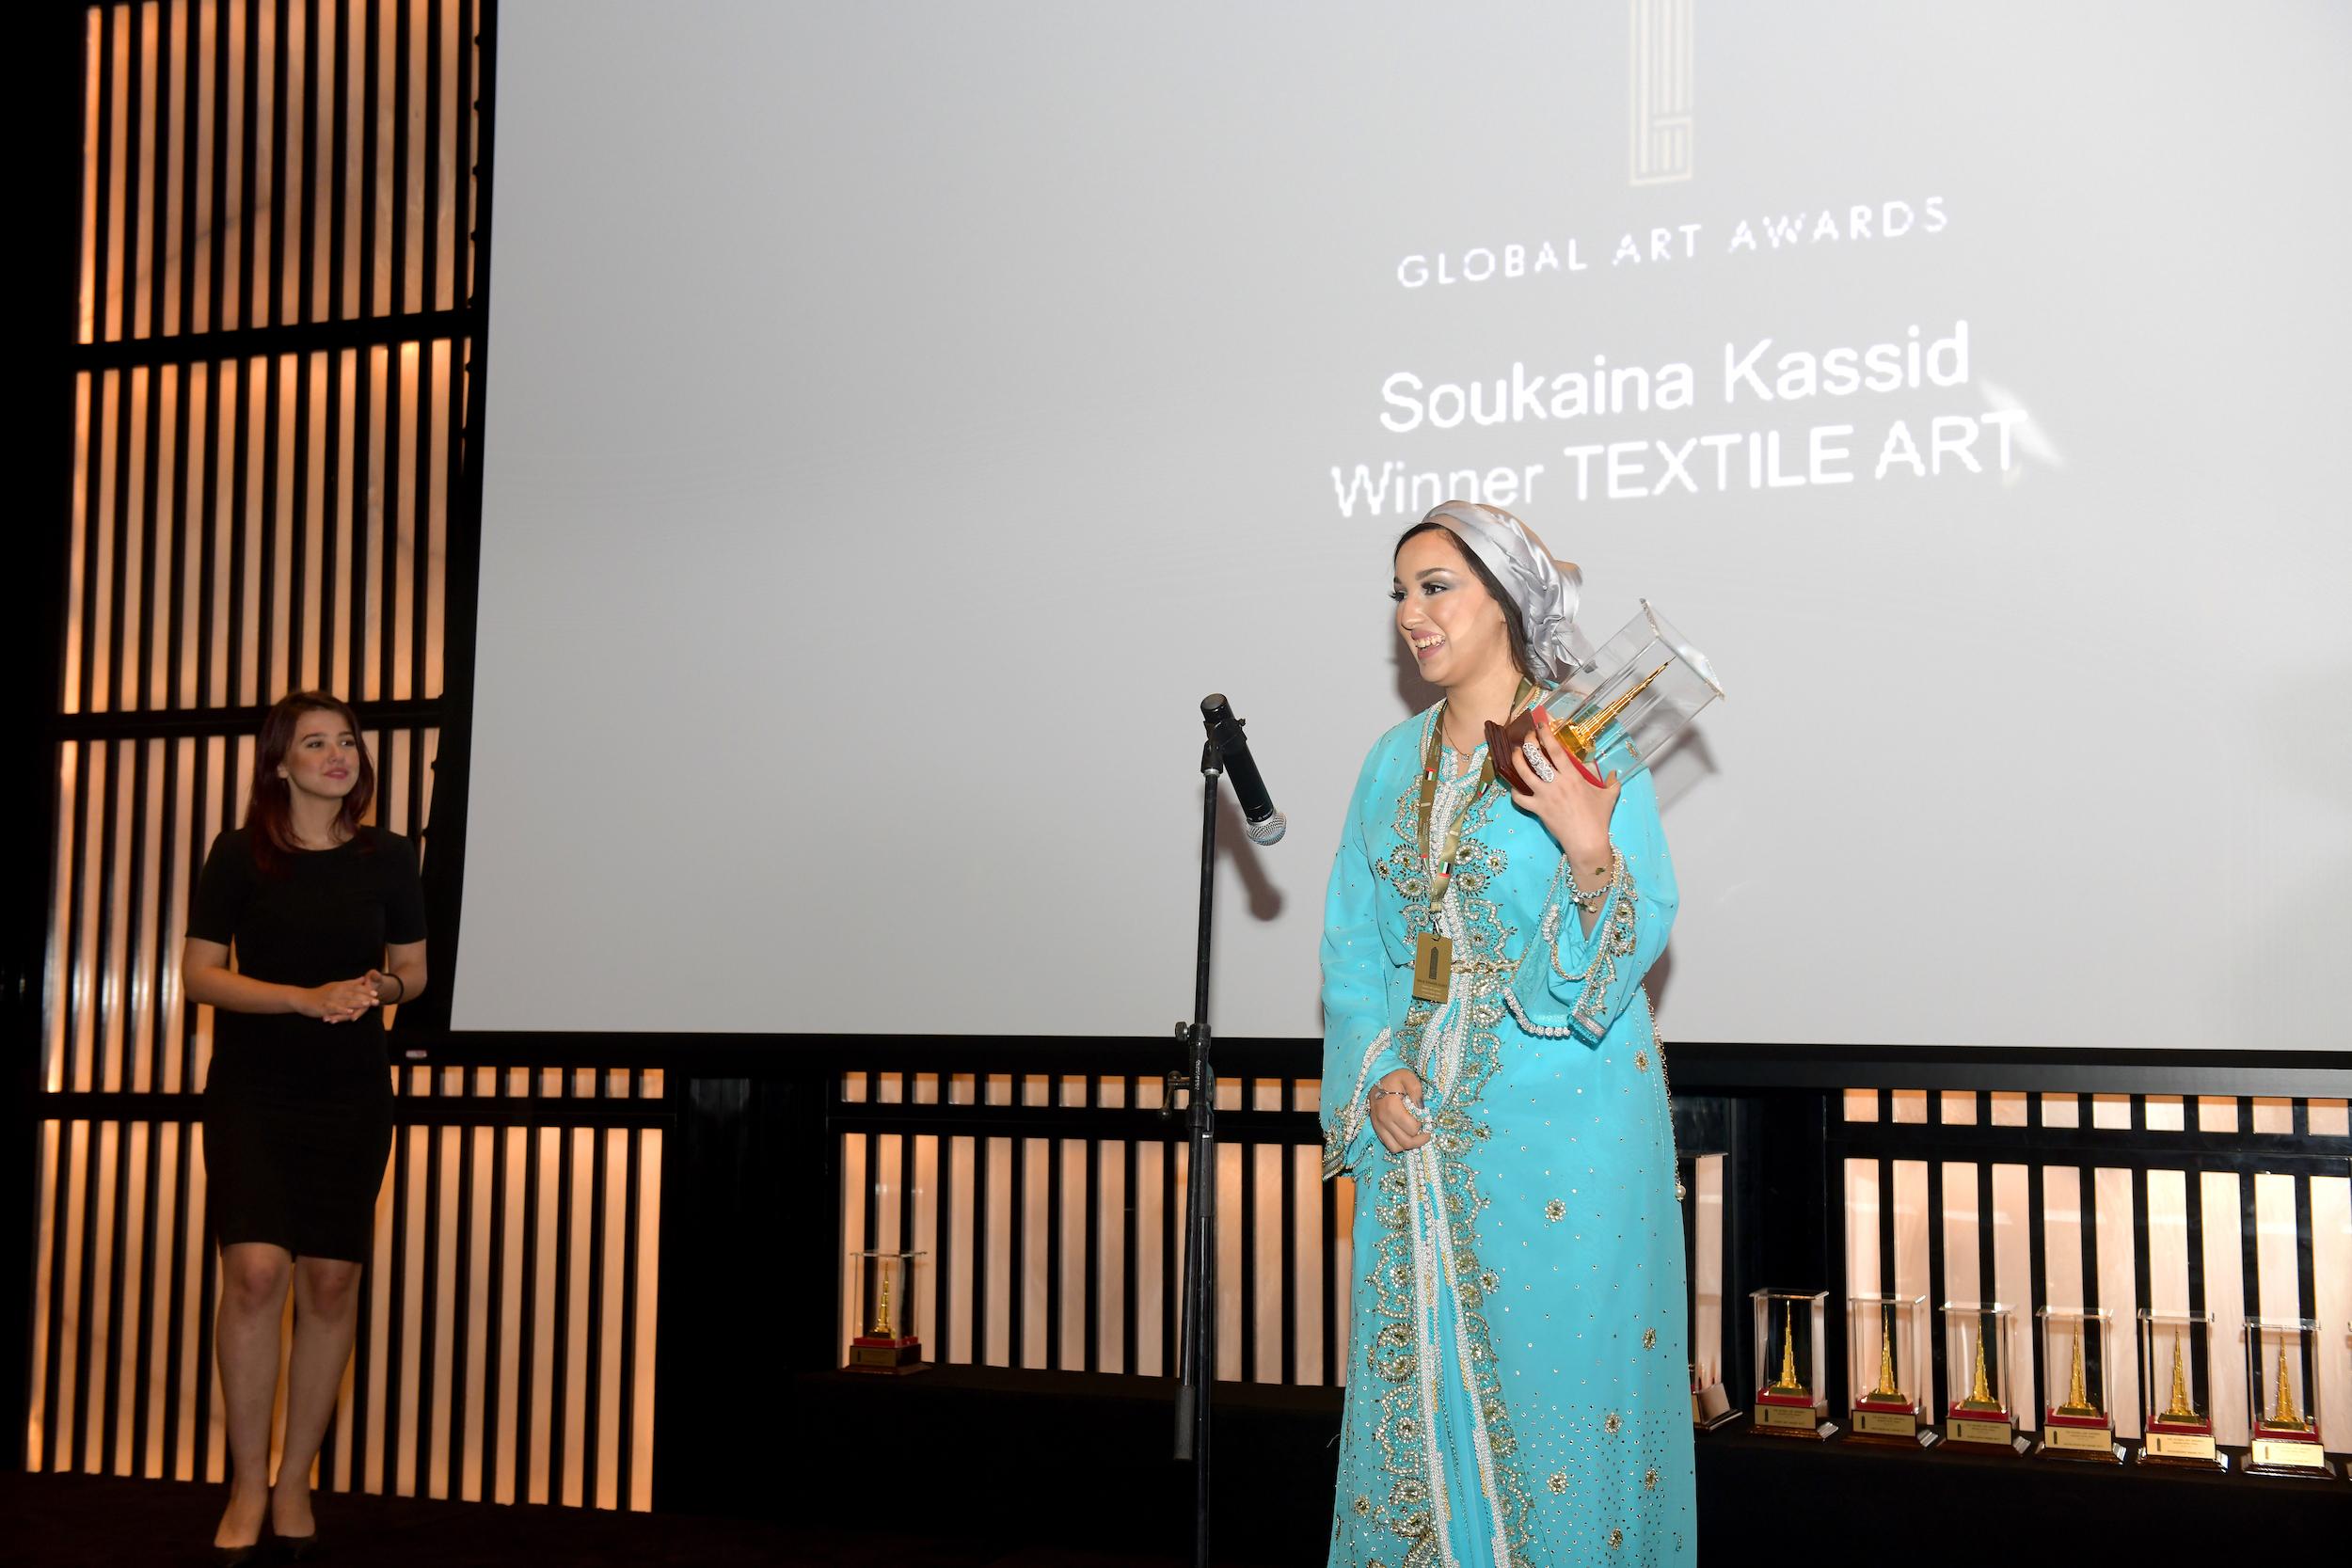 TEXTILE ART AWARD   SOUKAINA KASSID